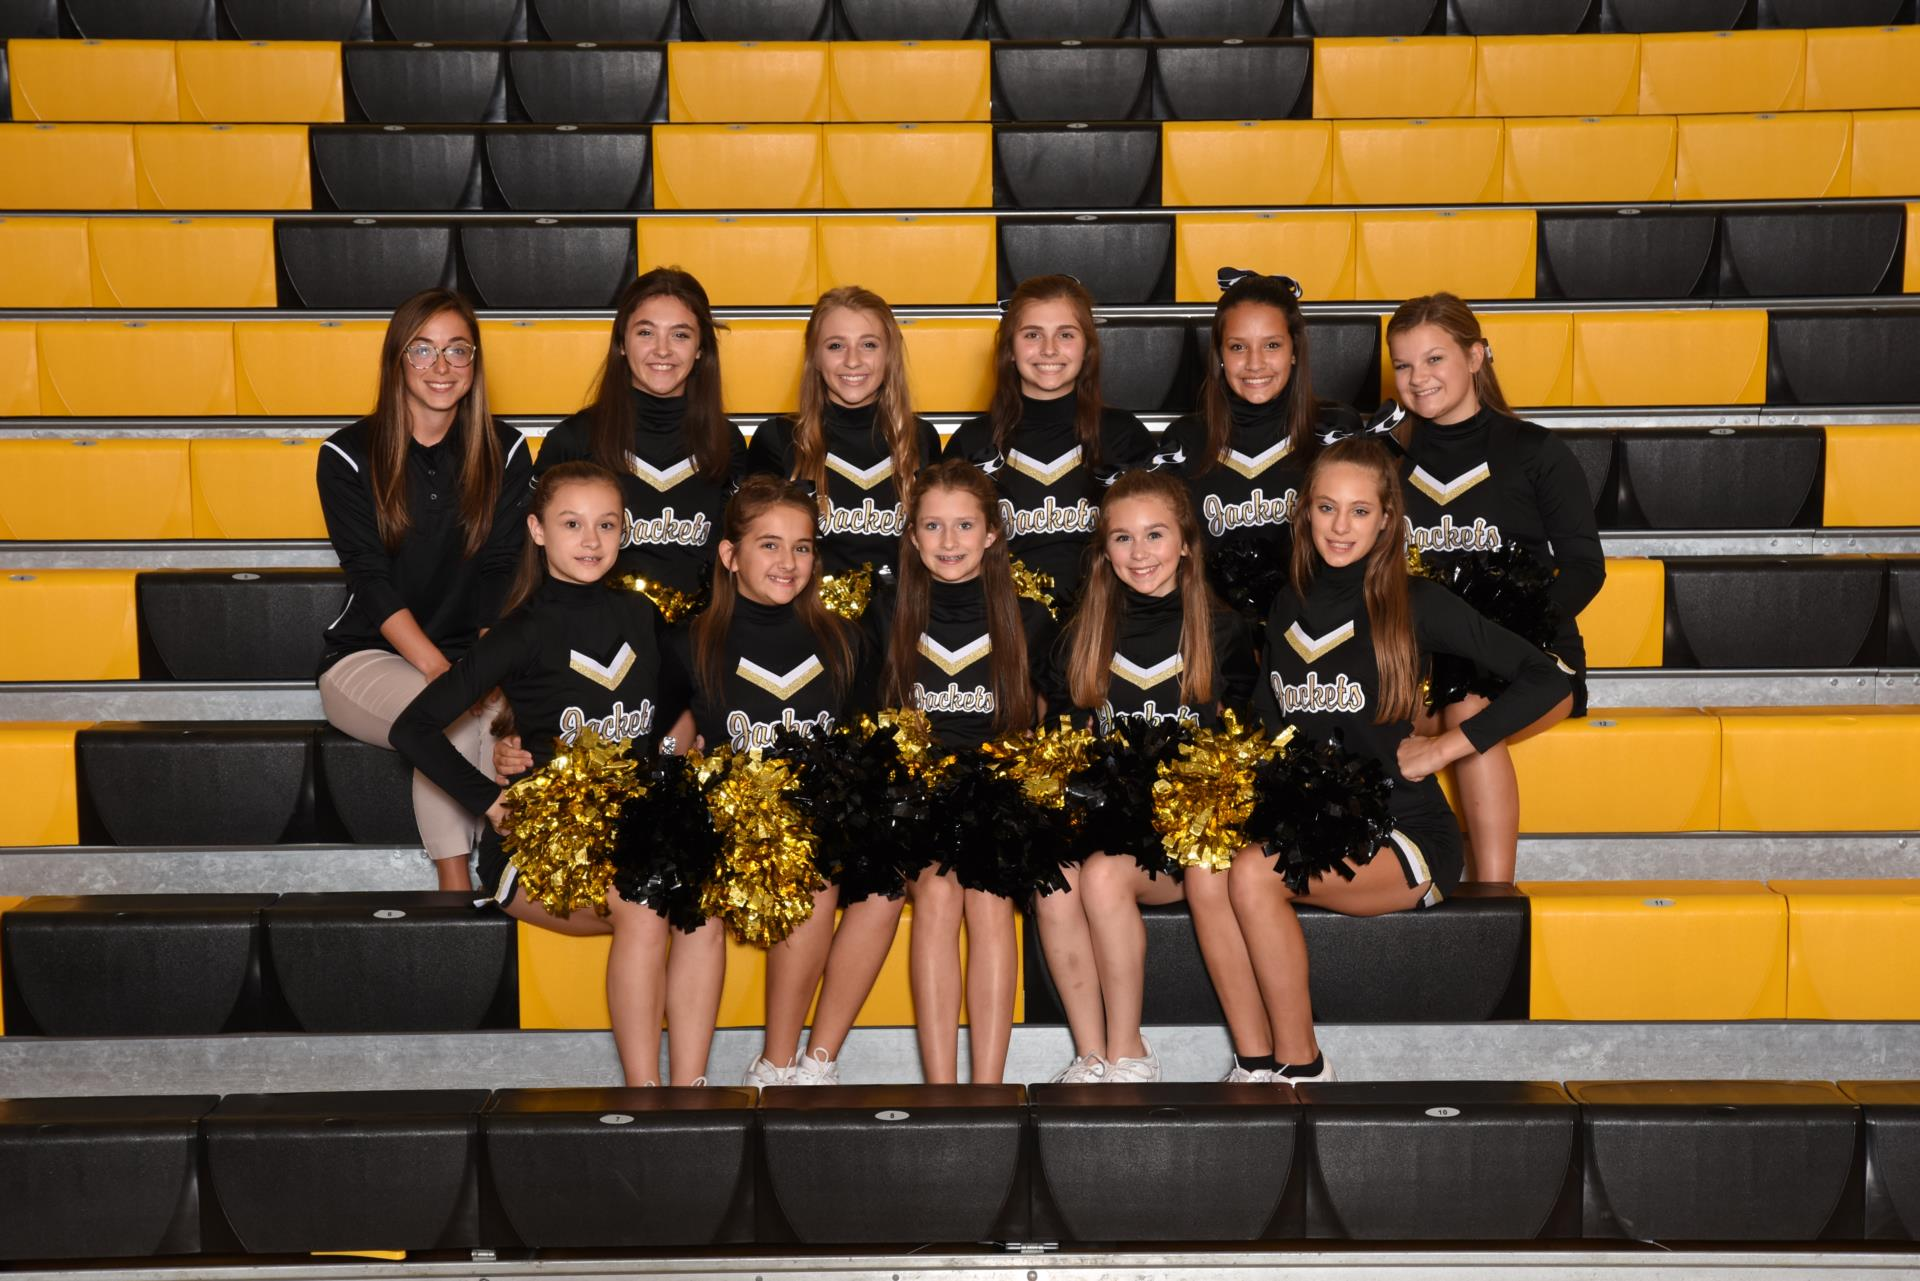 2017 8th grade football cheerleaders